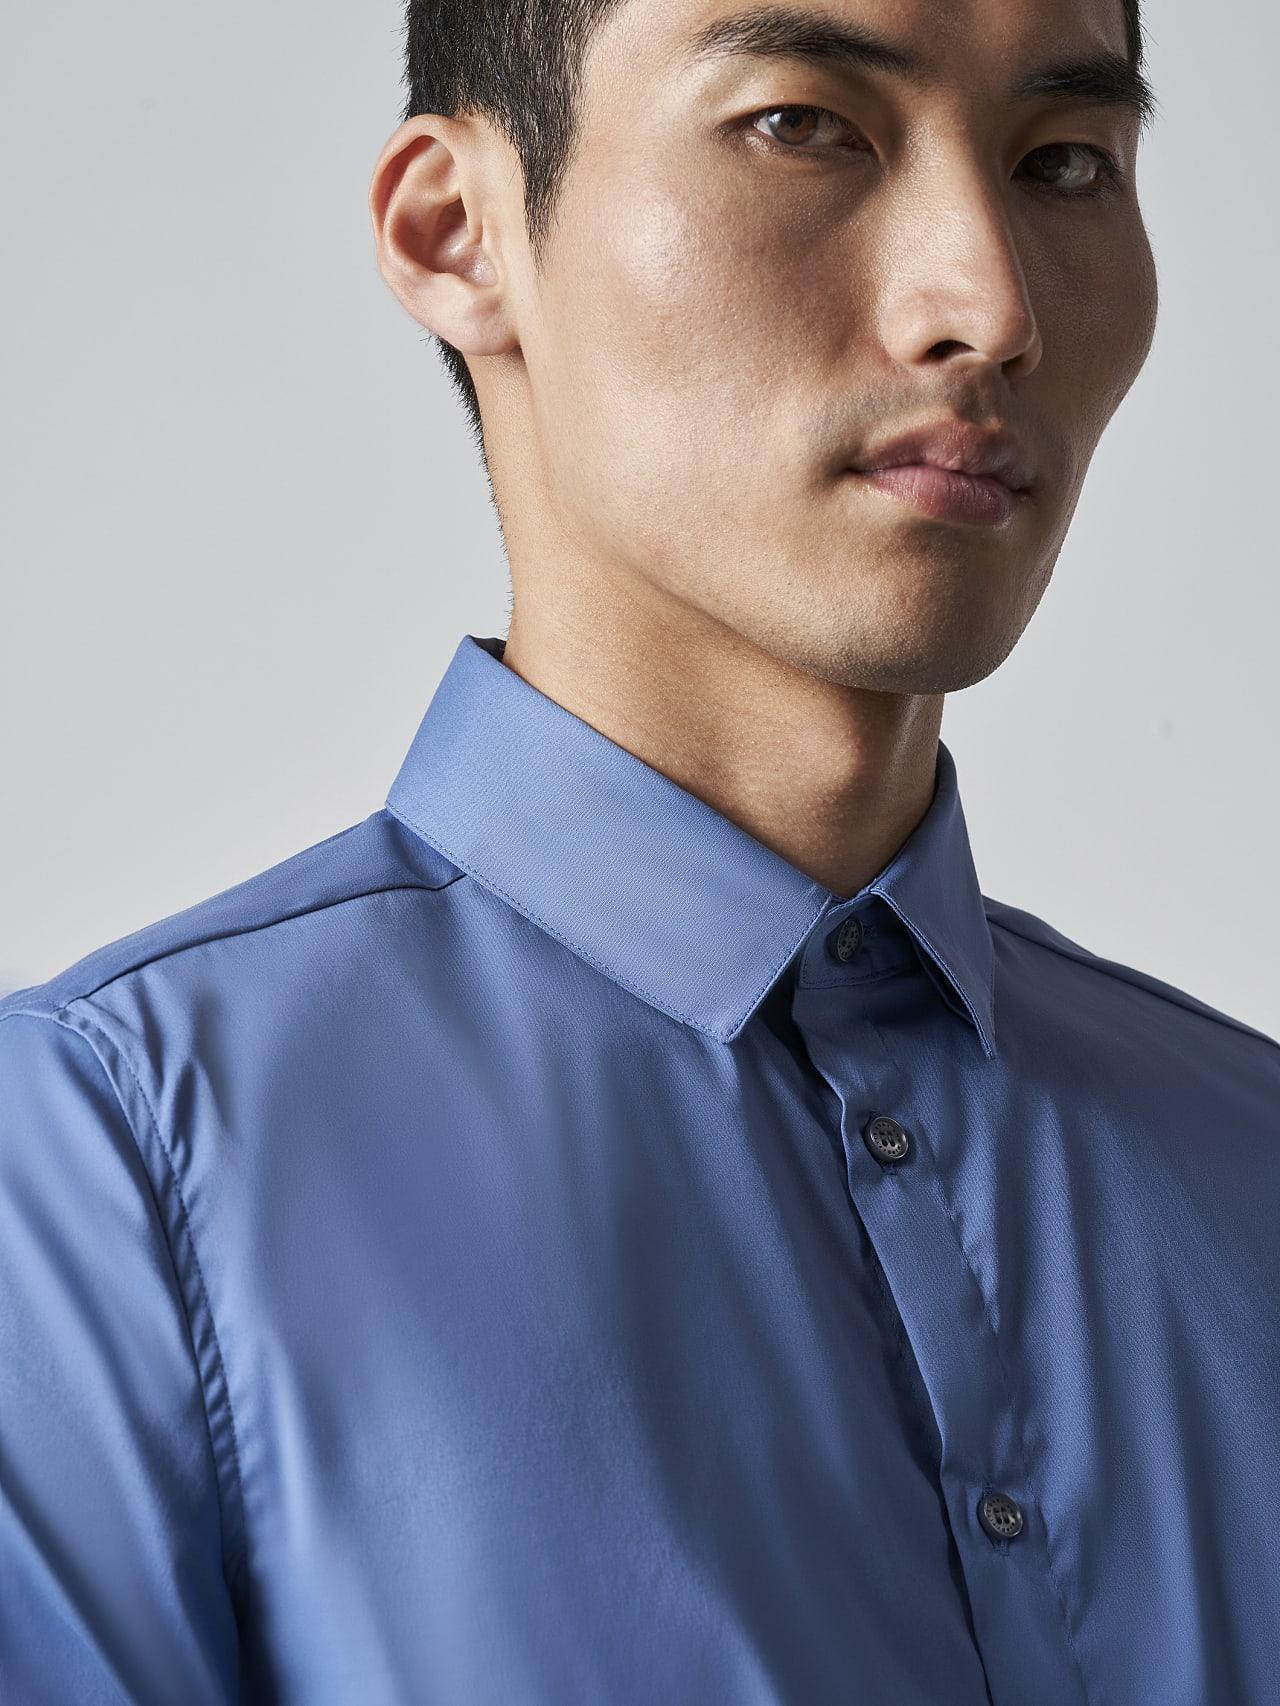 WAARG V2.Y5.02 Easy-Care Cotton Shirt light blue Right Alpha Tauri